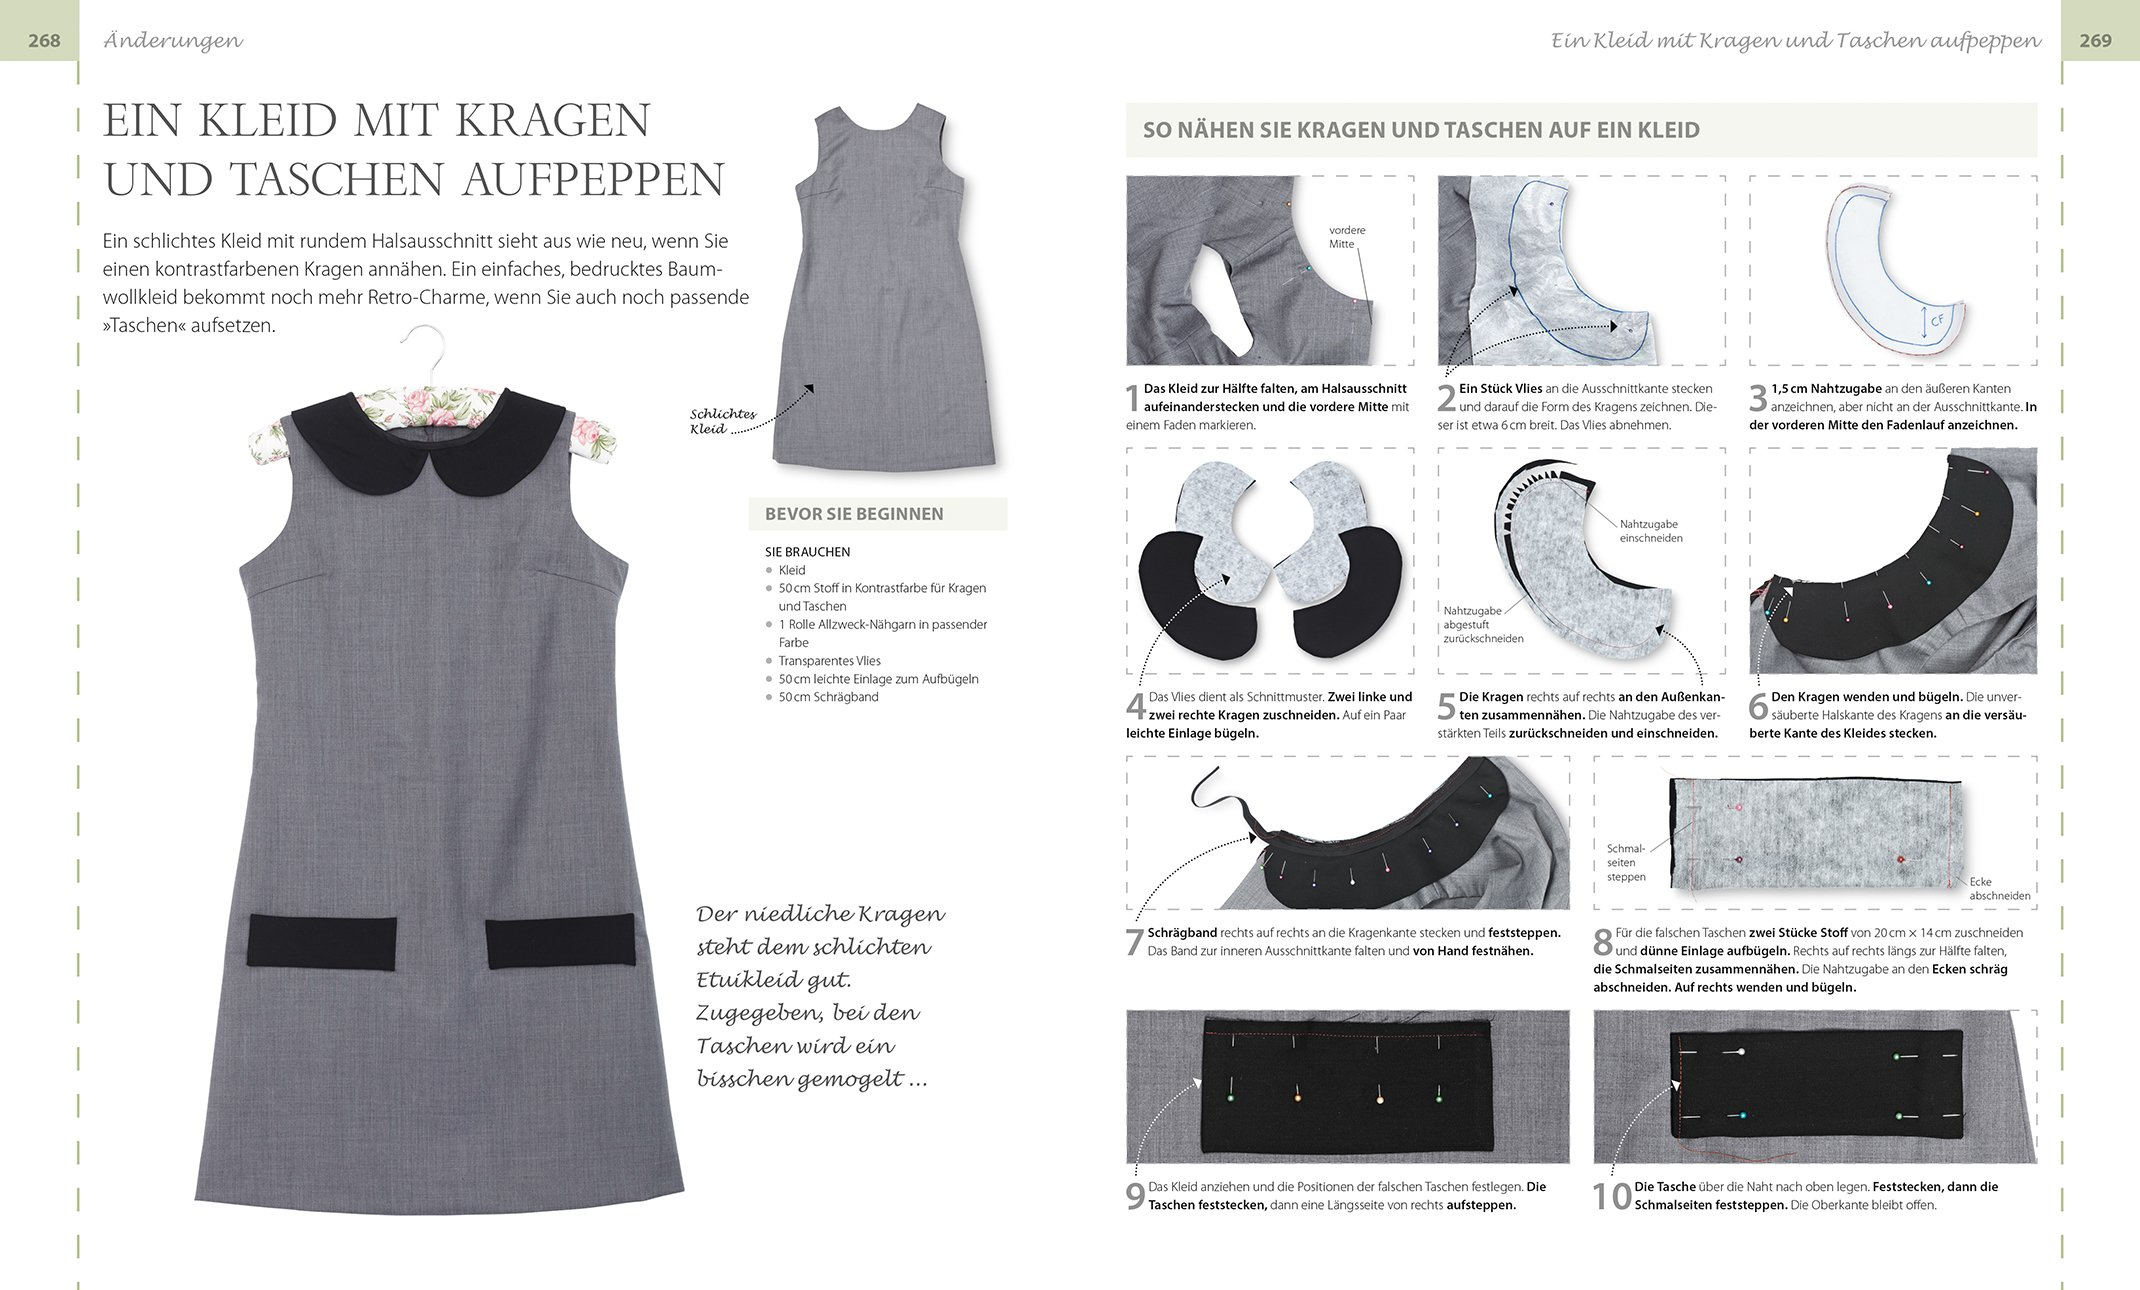 Maßgeschneidert: Schritt für Schritt zur selbst genähten Garderobe ...